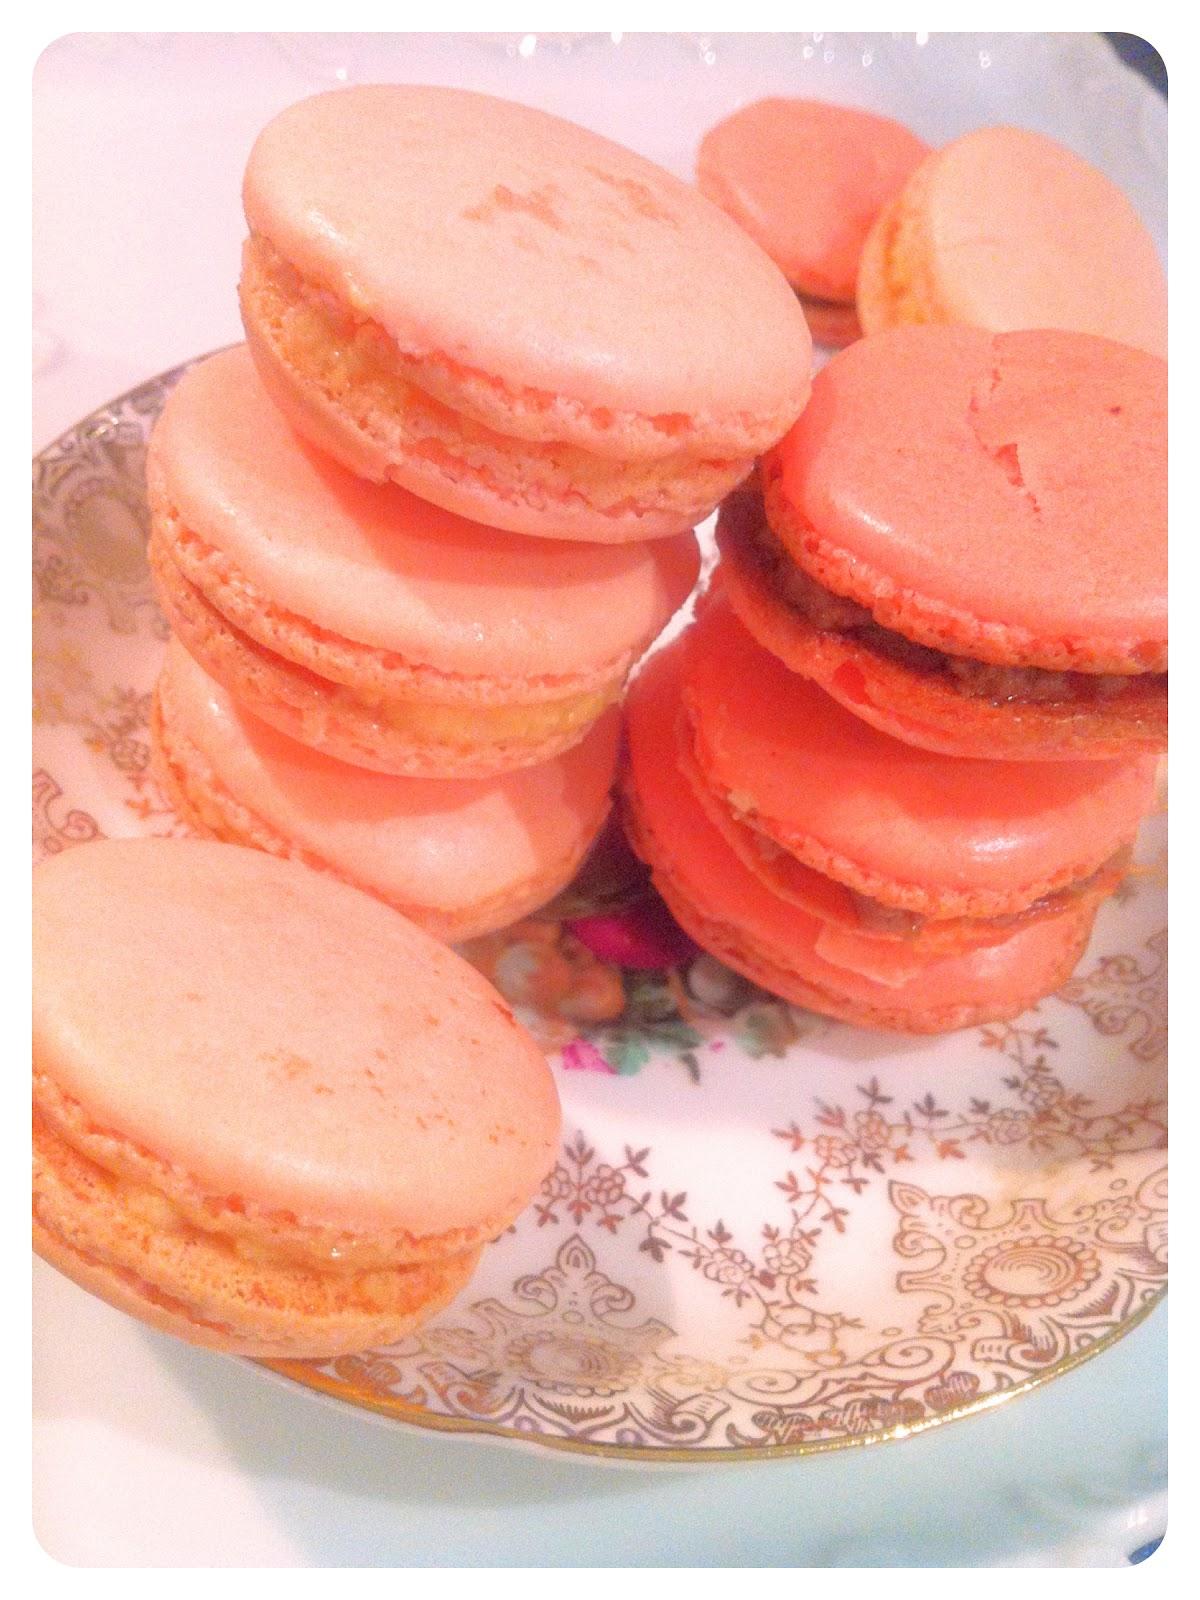 rose water macaron Cherie Kelly Cake London